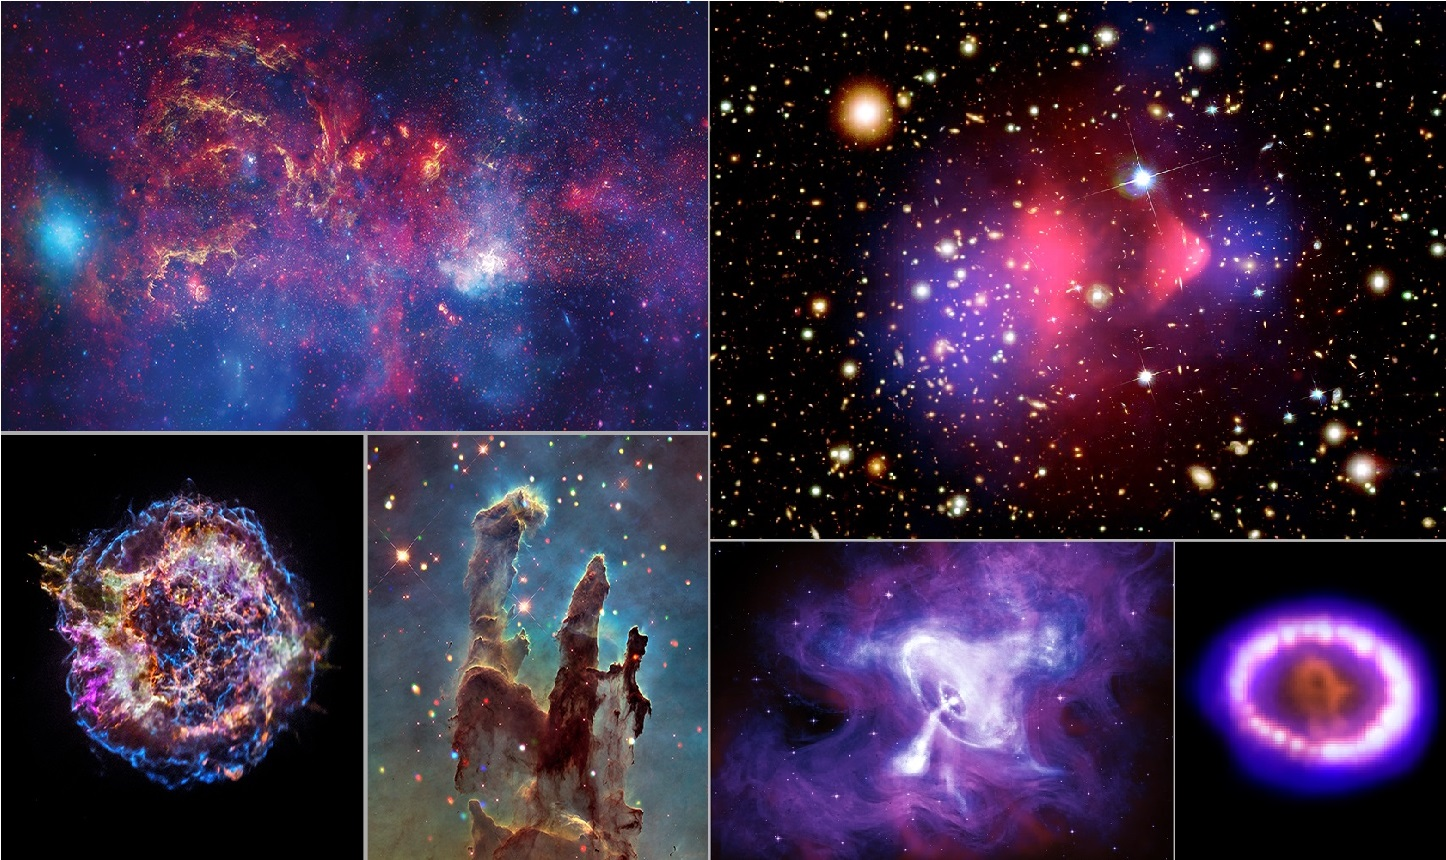 Izvor: X-ray: NASA/CXC/SAO / NASA/STScI; IR: Spitzer NASA/JPL-Caltech.